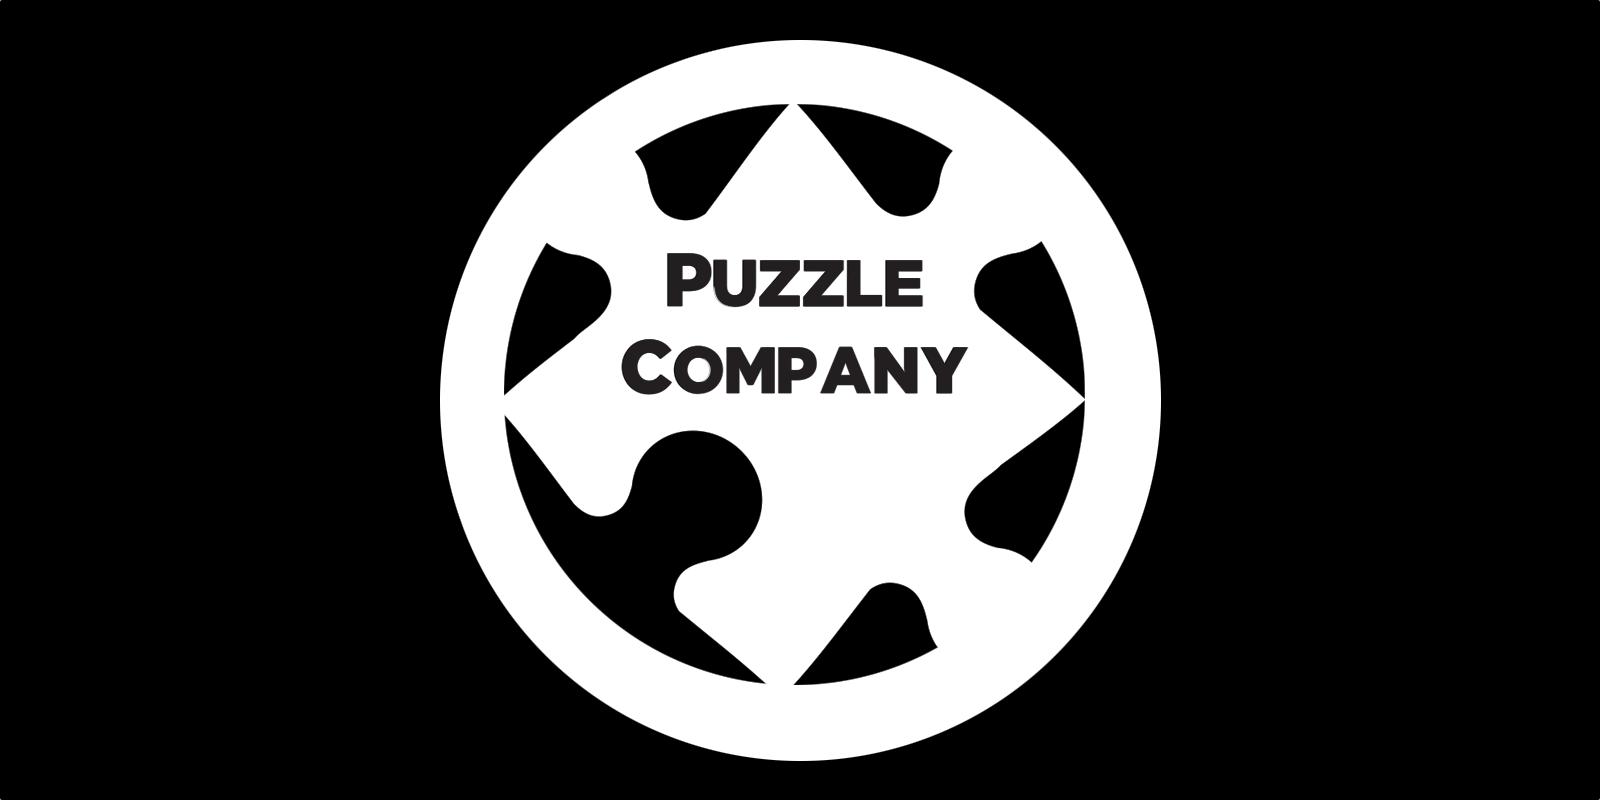 Puzzle Company